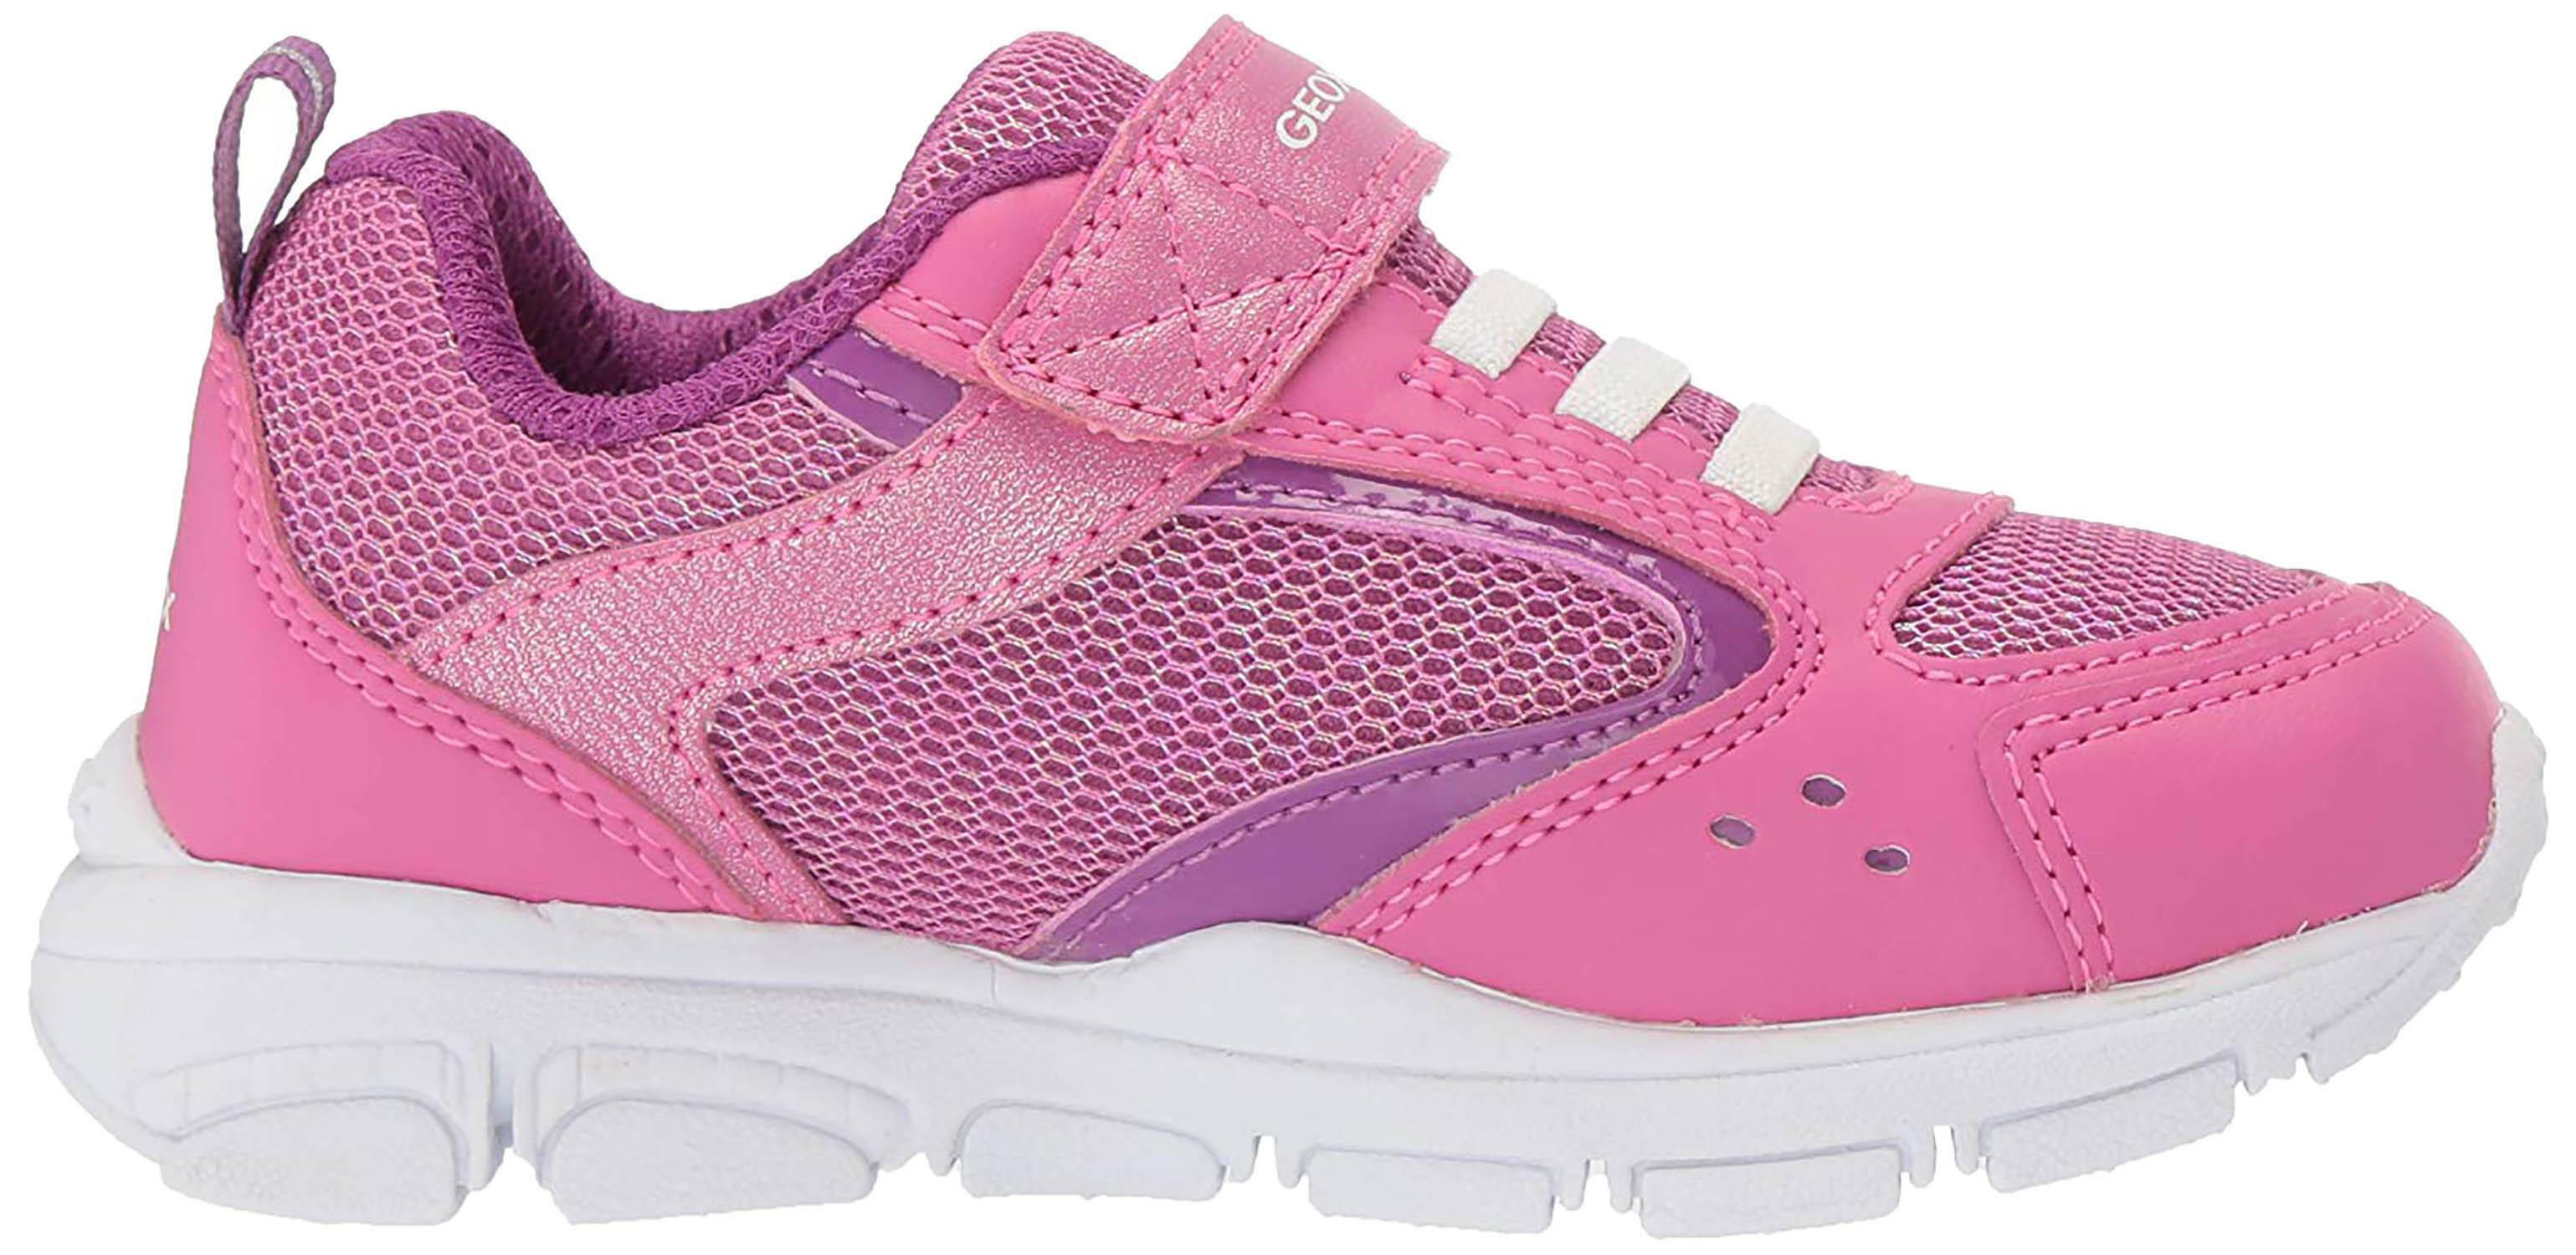 geox j n.torque g scarpe bambina rosa j928hac8095